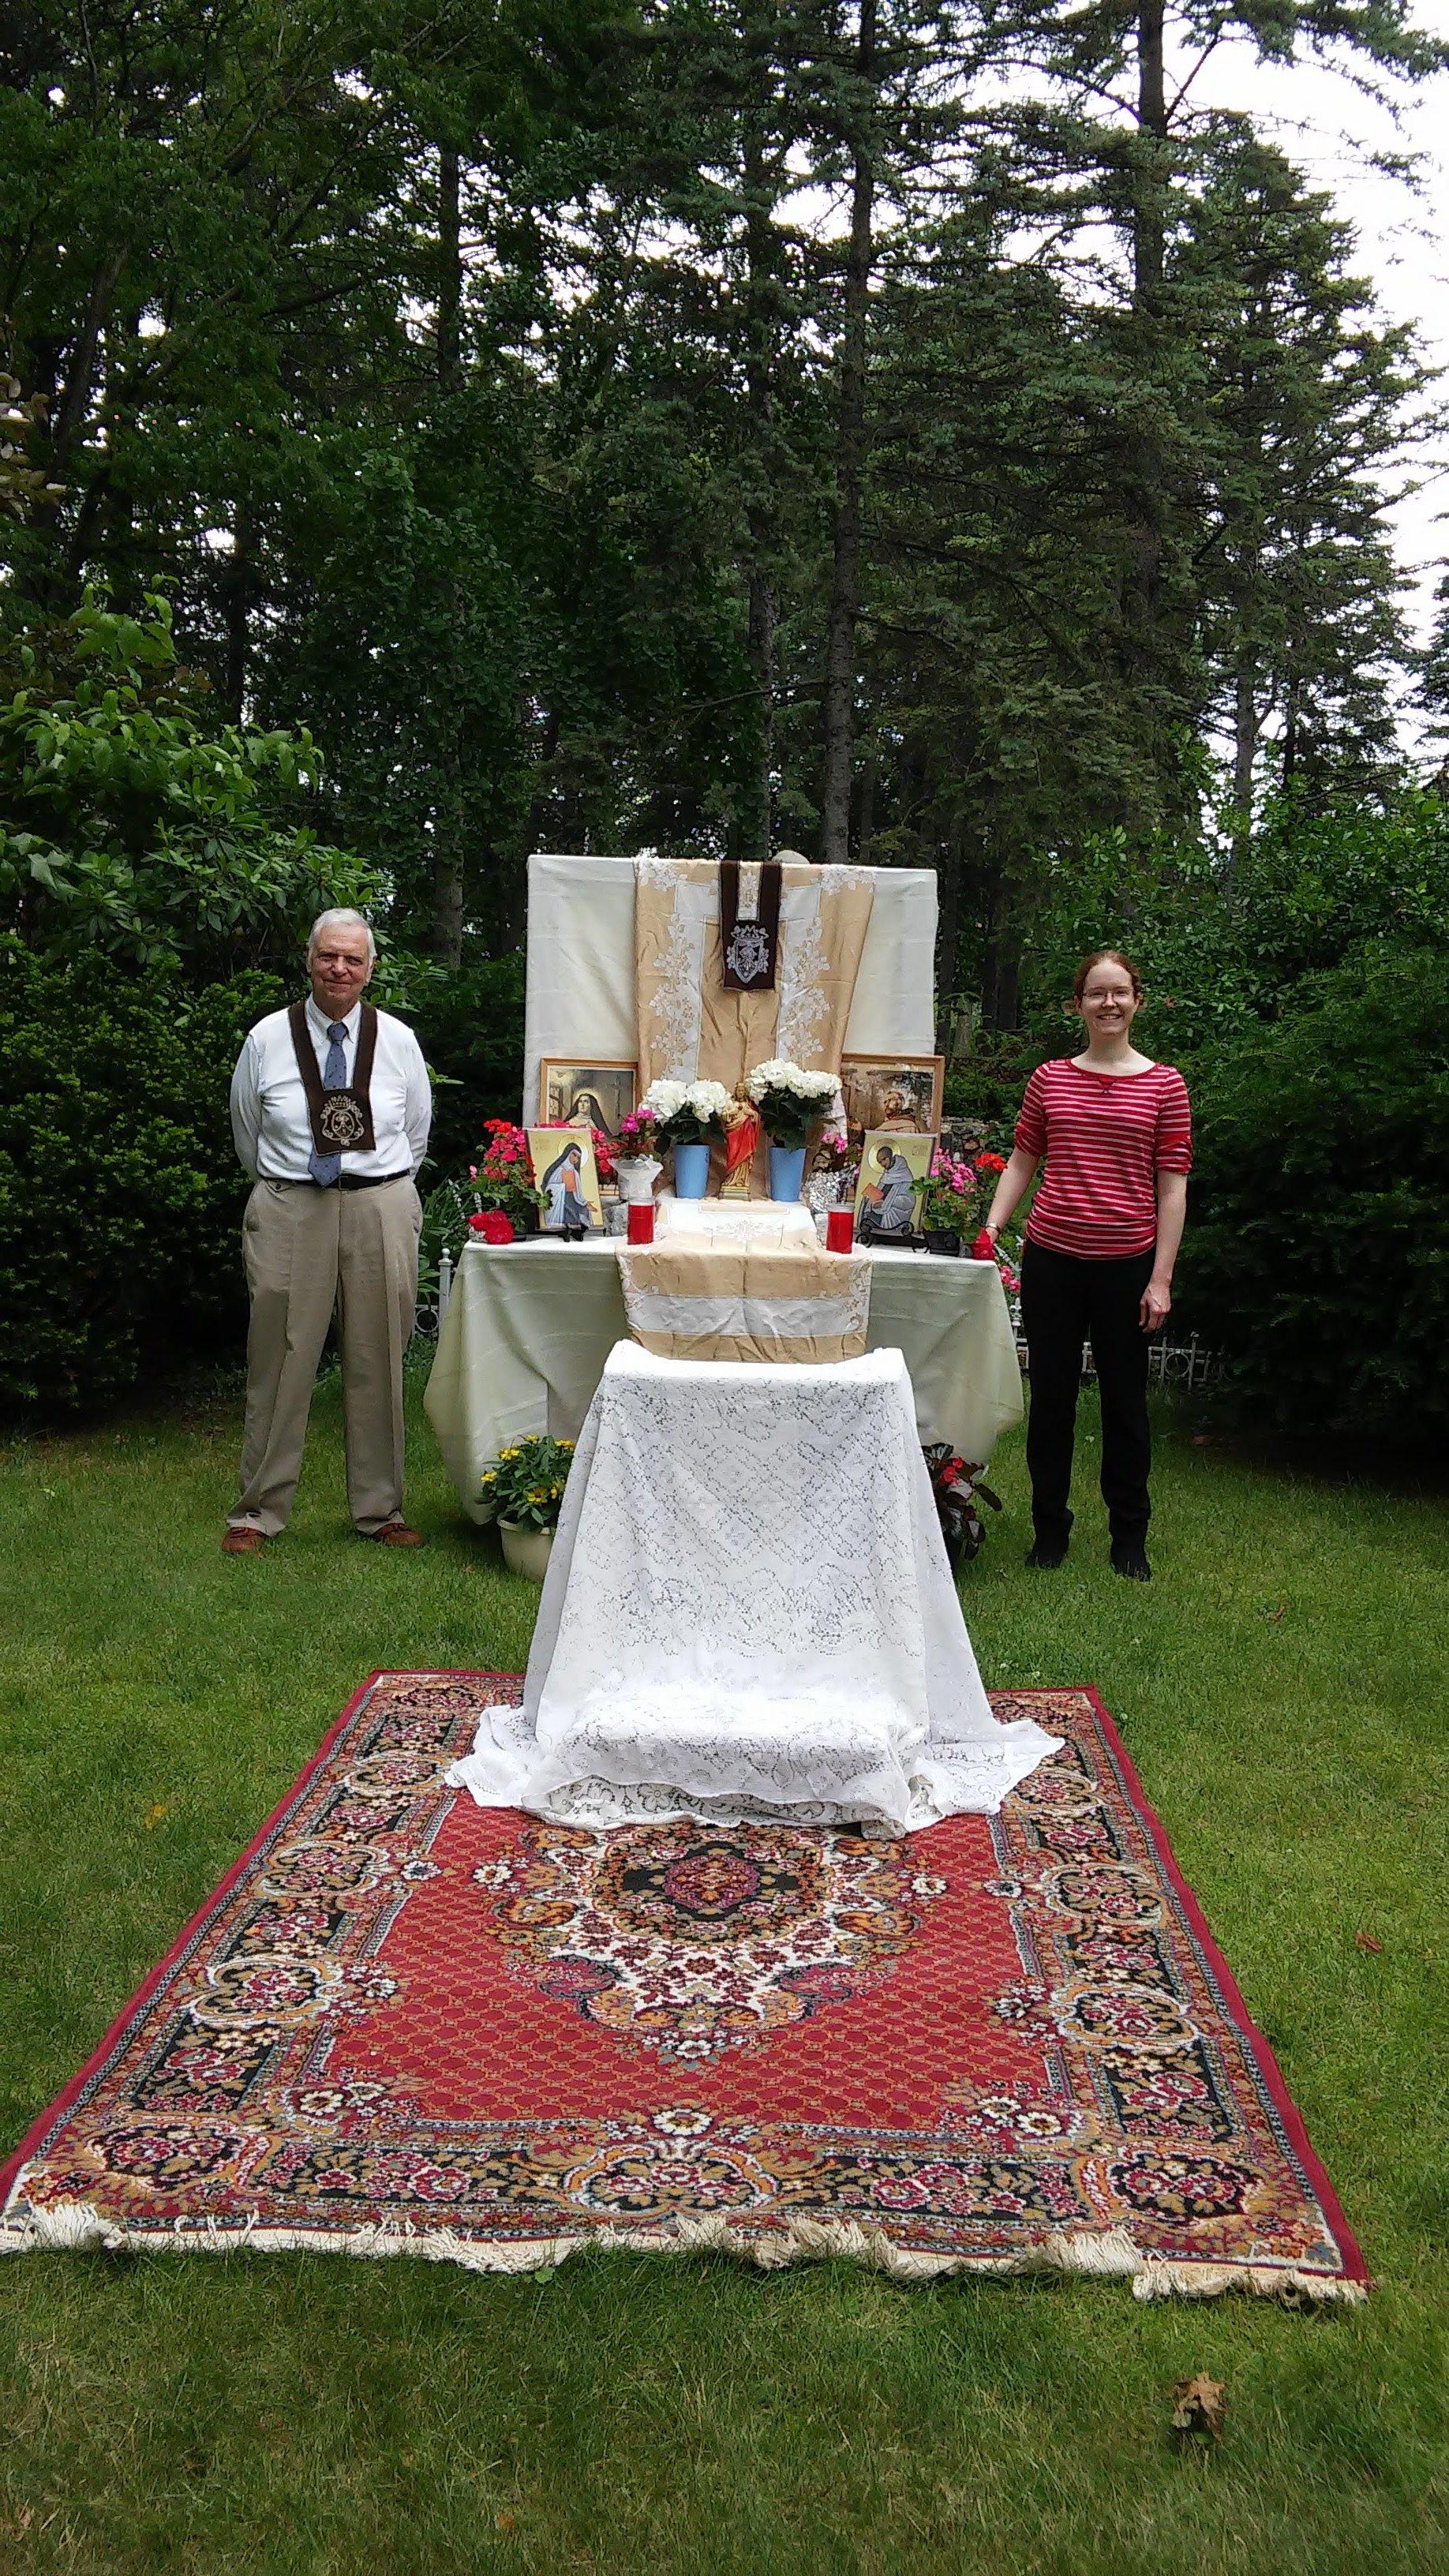 Corpus Christi Altar - Every year on Corpus Christi Sunday, our Secular Carmelite Community joins other organizations in decorating an altar on the monastery grounds.